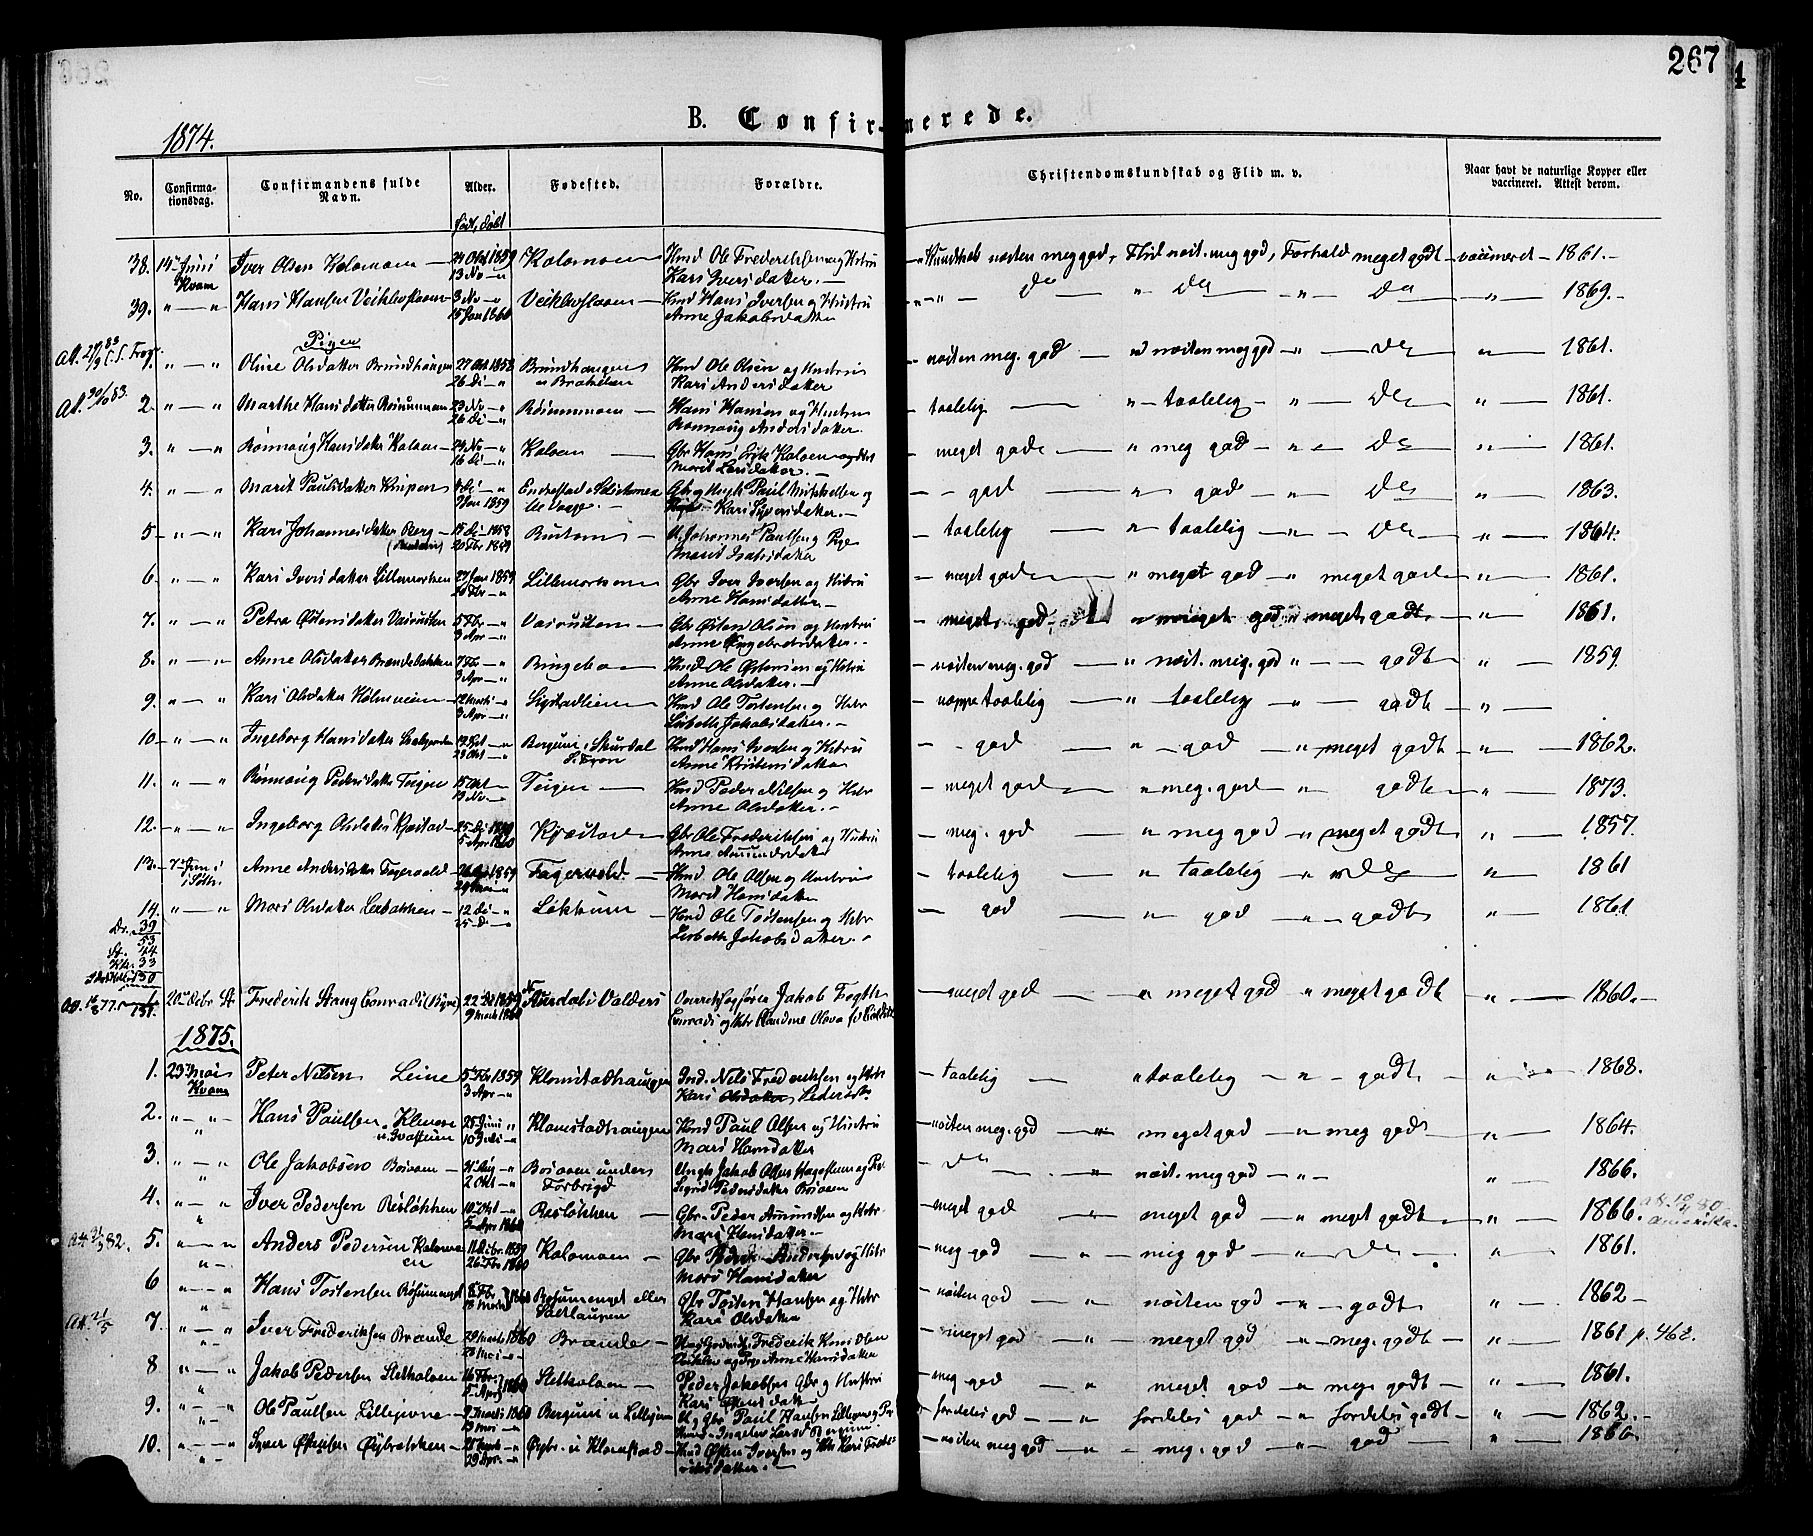 SAH, Nord-Fron prestekontor, Ministerialbok nr. 2, 1865-1883, s. 267